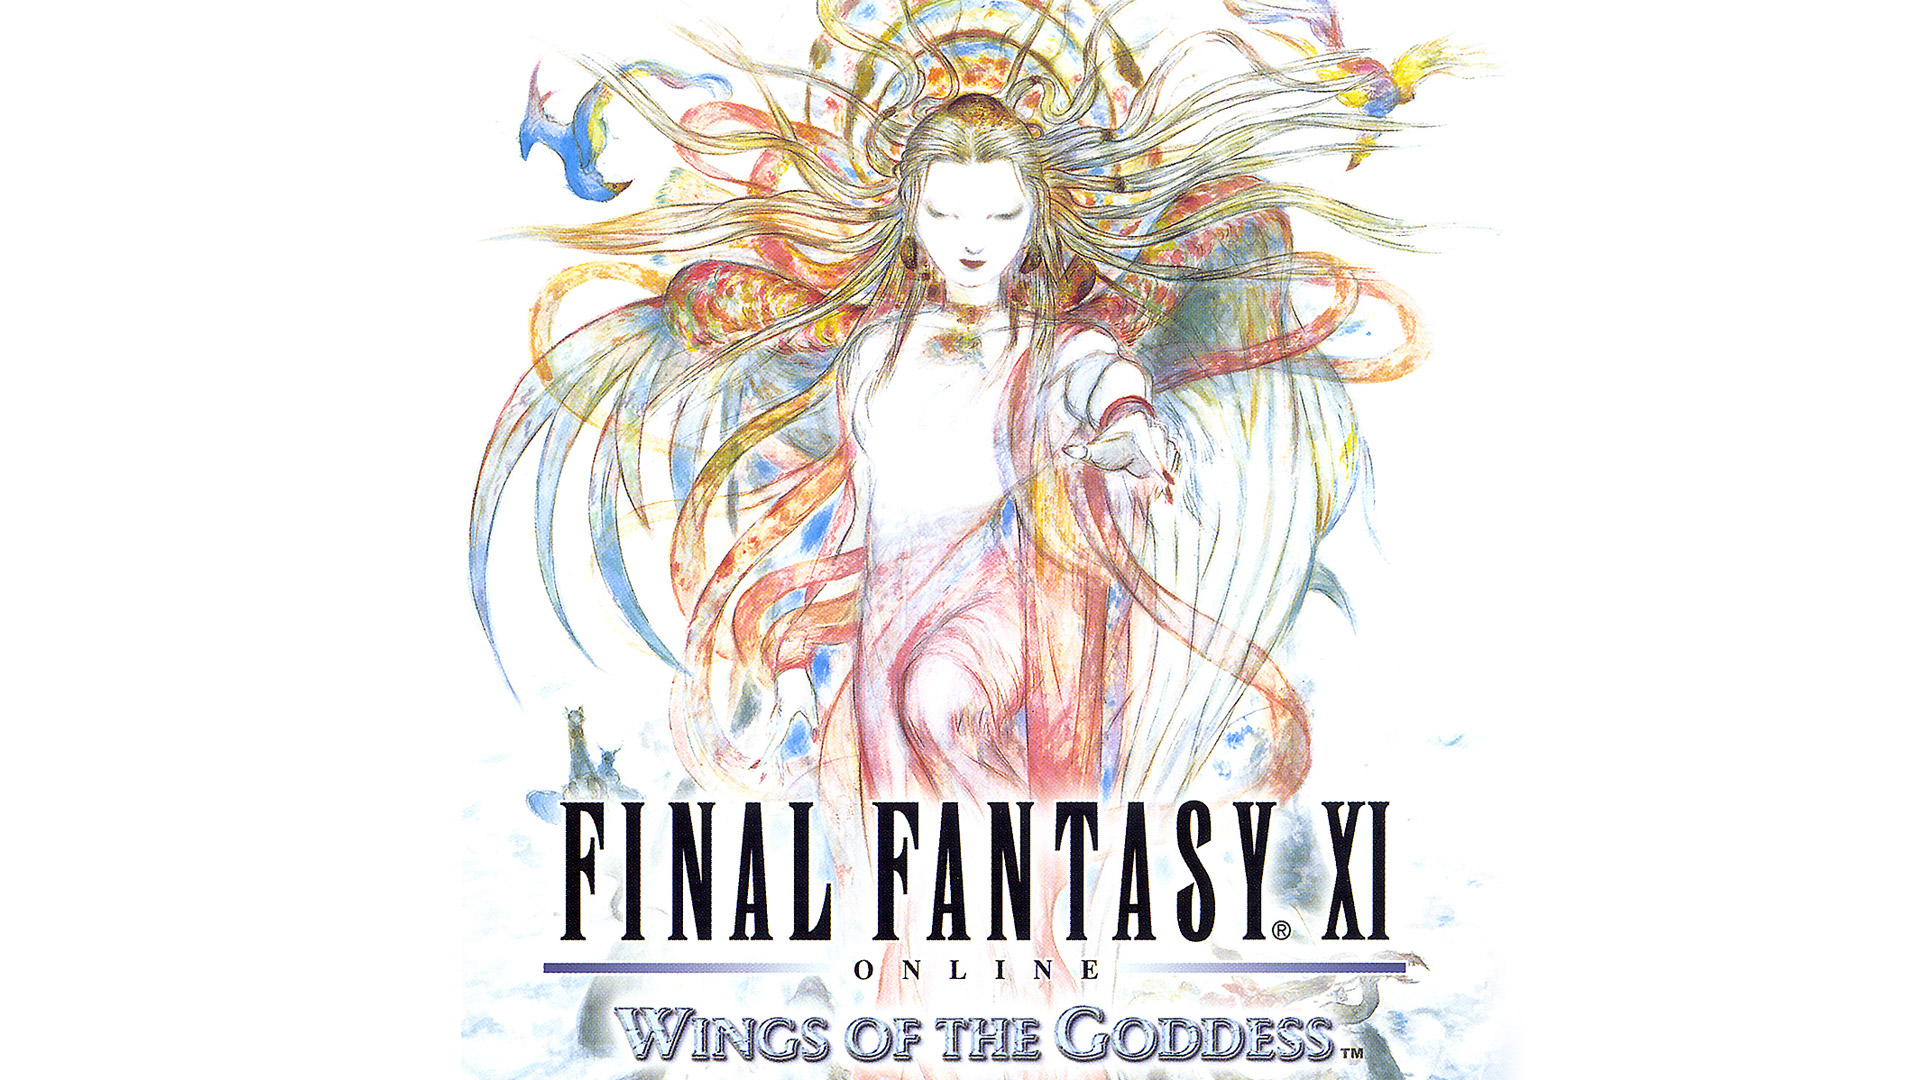 Final Fantasy XI Wallpaper in 1920x1080